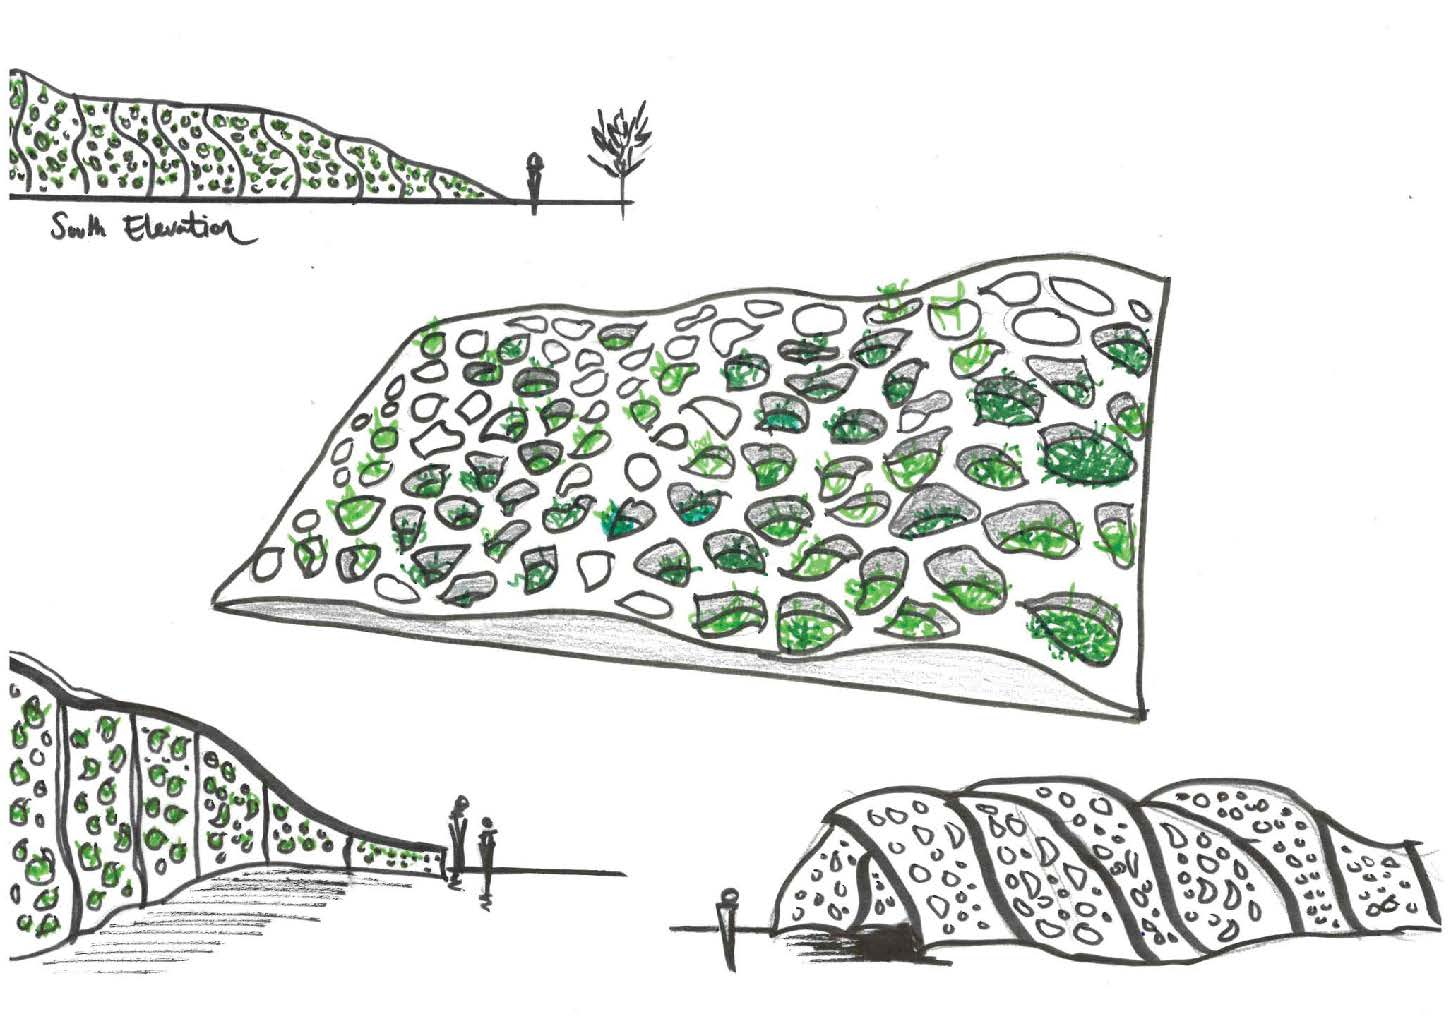 Collective Studio, Plant Modern and Farah